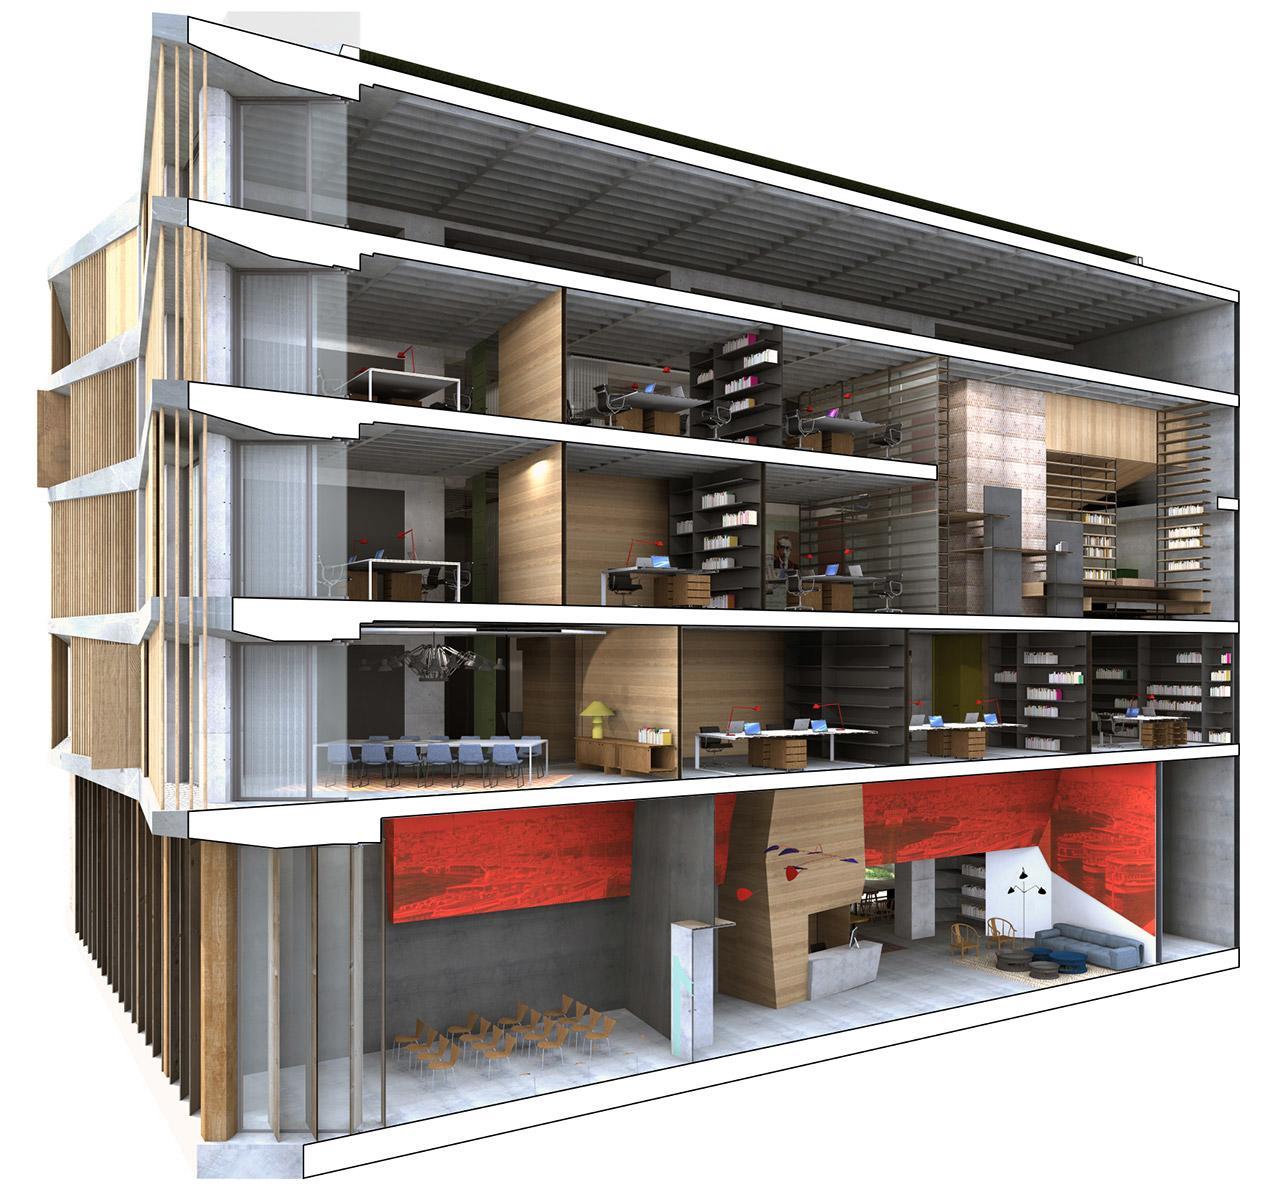 SGT-ADMINISTRATIVE-BUILDING-REFURBISHMENT-SPACELAB-01